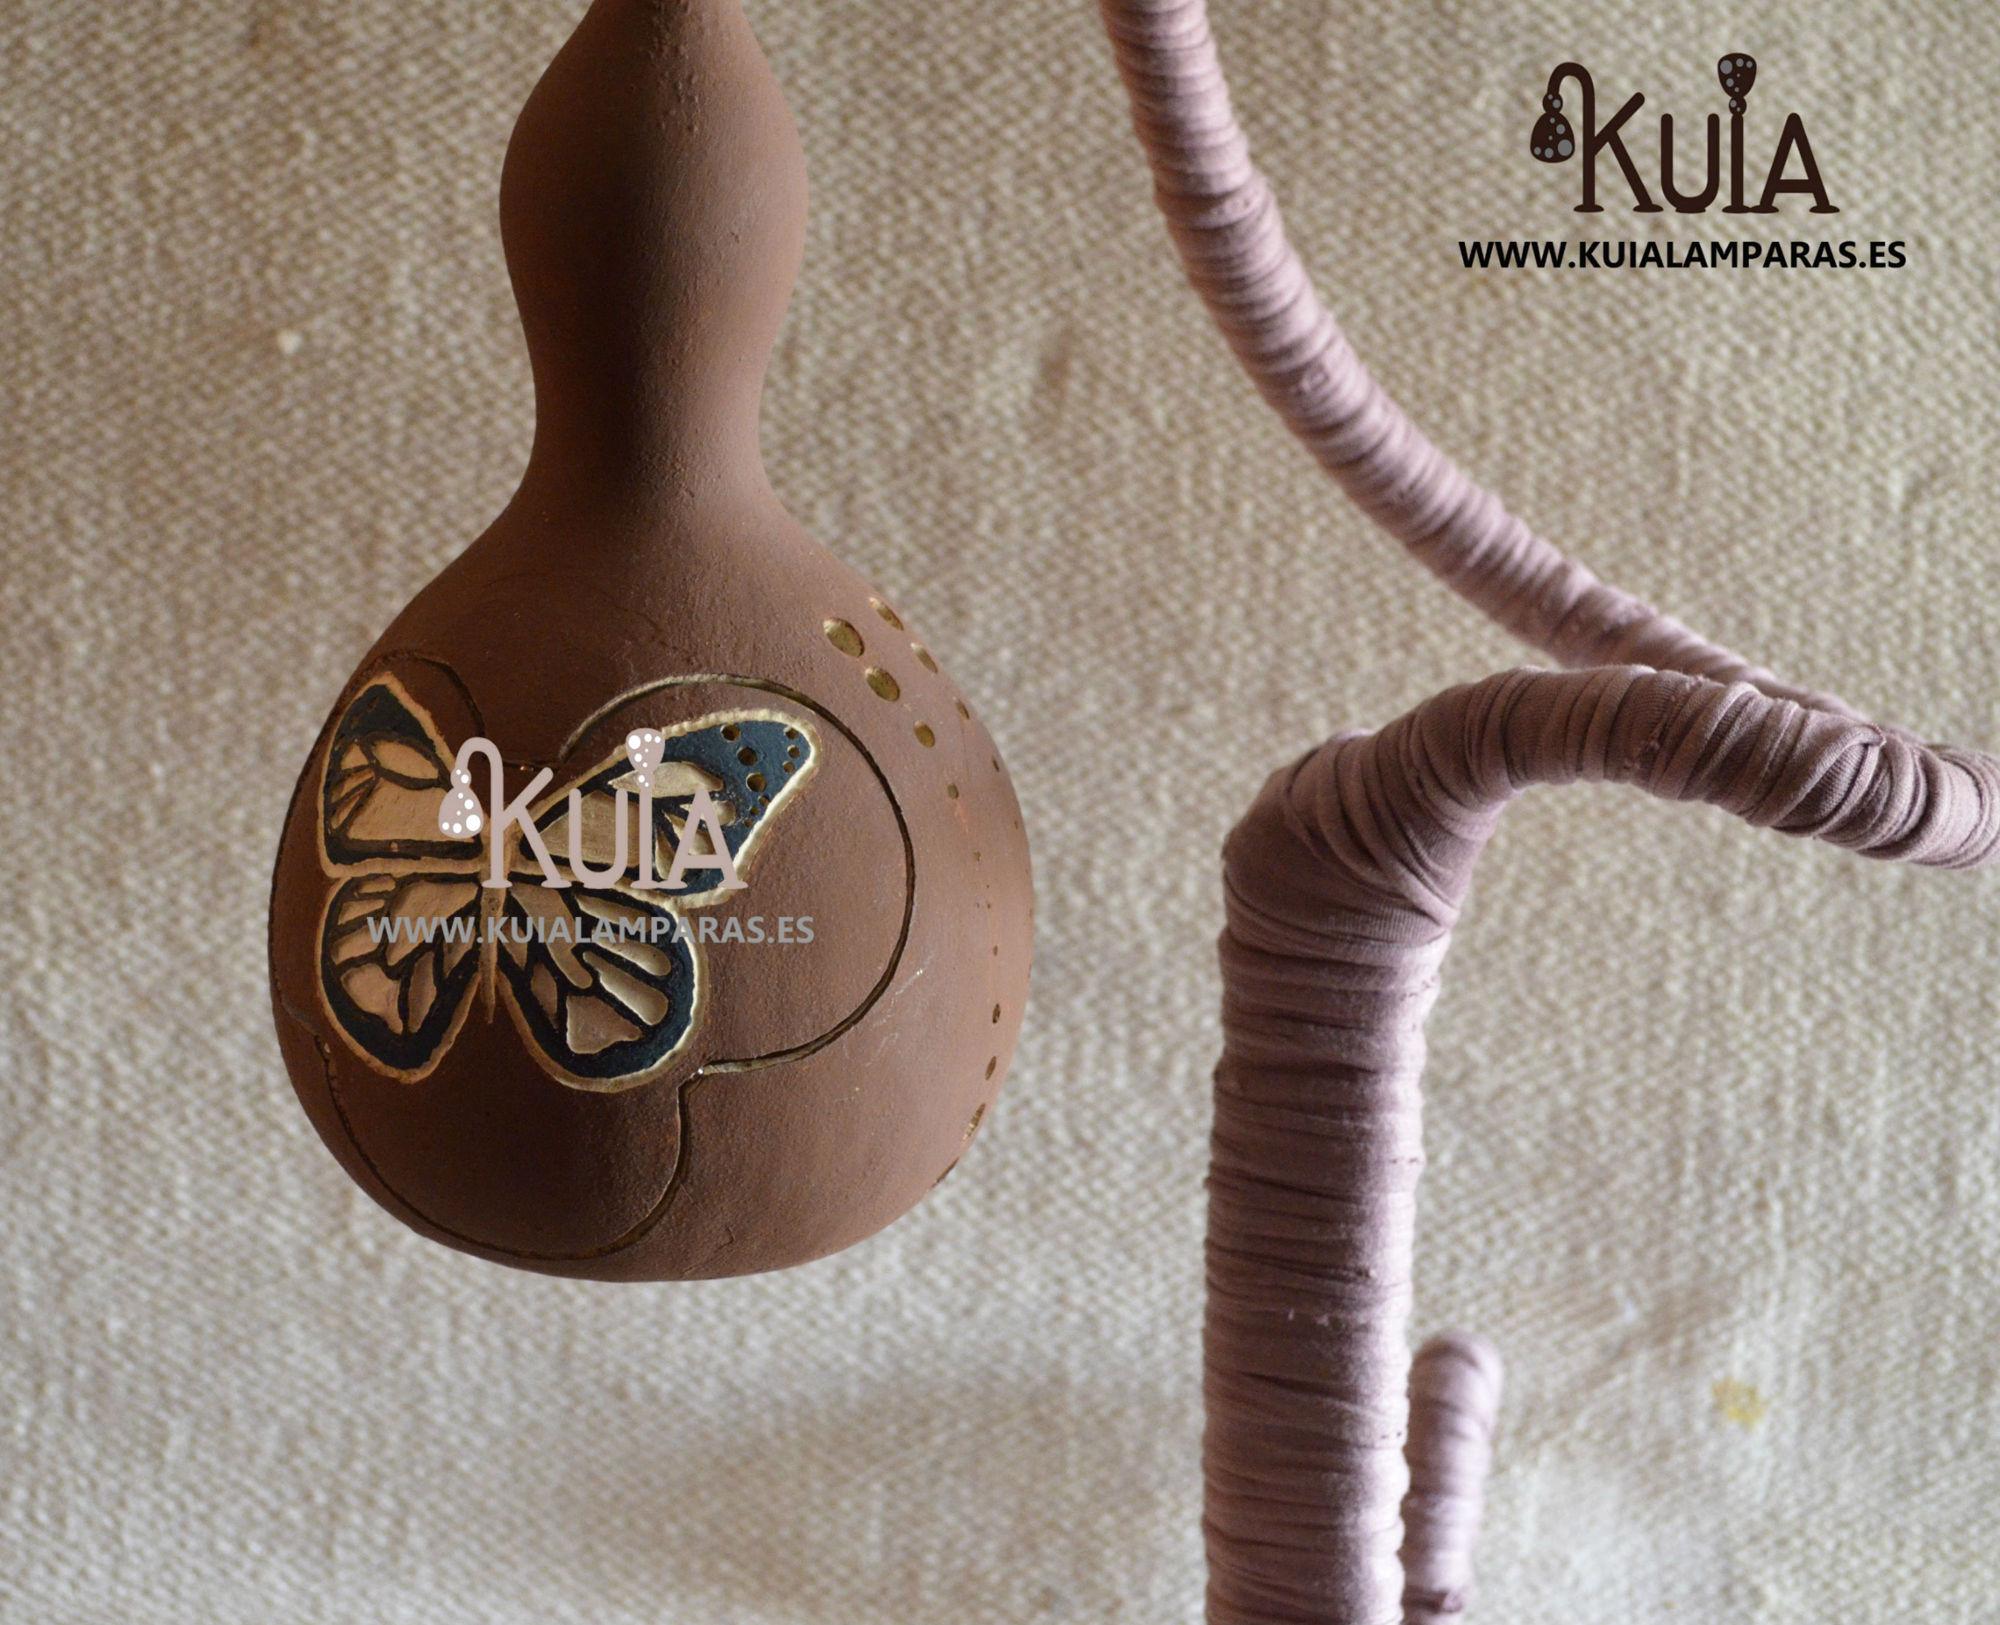 lampara artesana de decoracion pinpilinpauxa